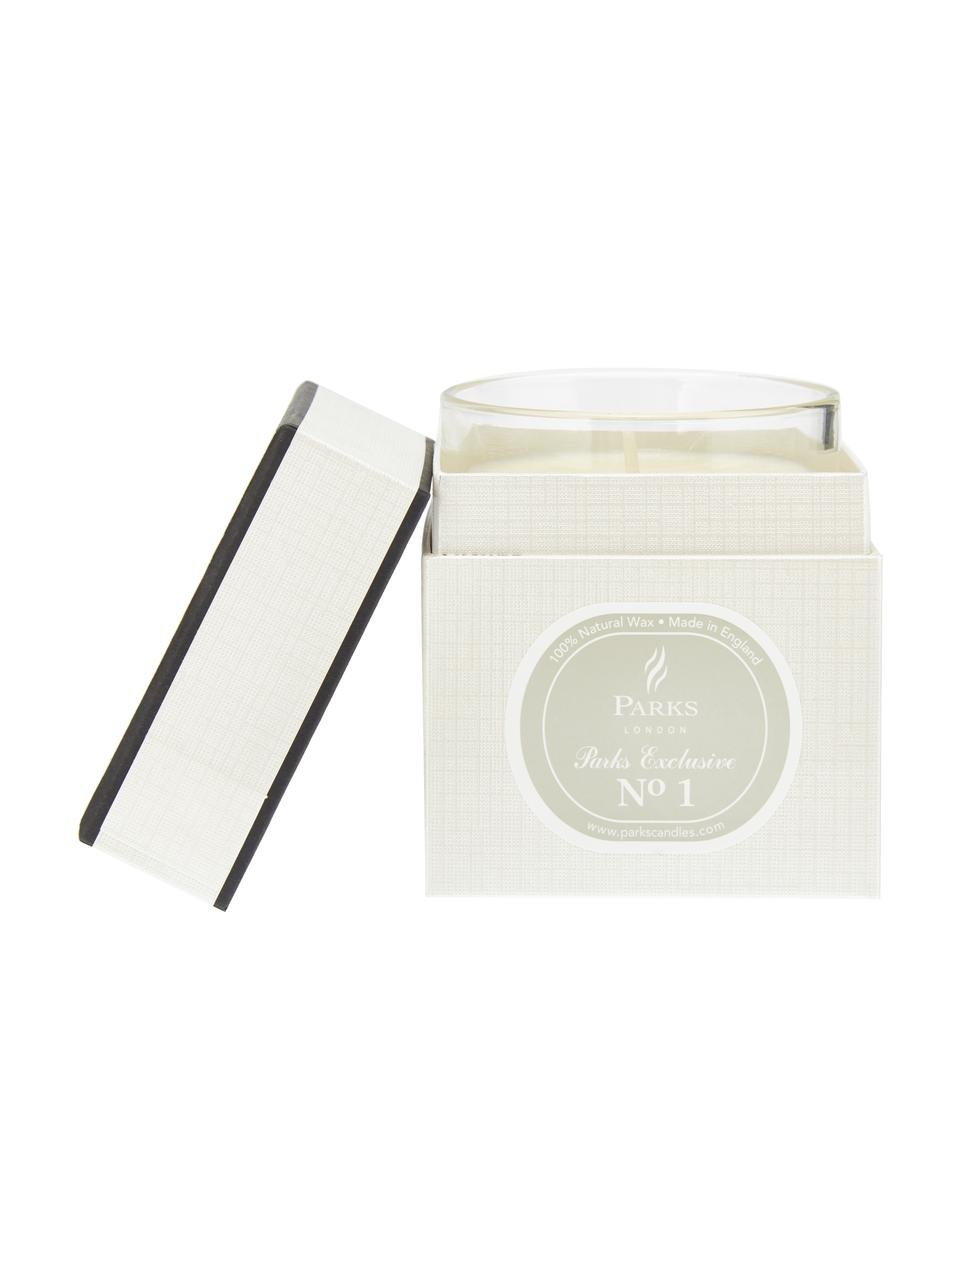 Duftkerze Exclusive No 1 (Sandelholz & Vanille), Behälter: Milchglas, Transparent, Weiß, Grau, Ø 8 x H 9 cm